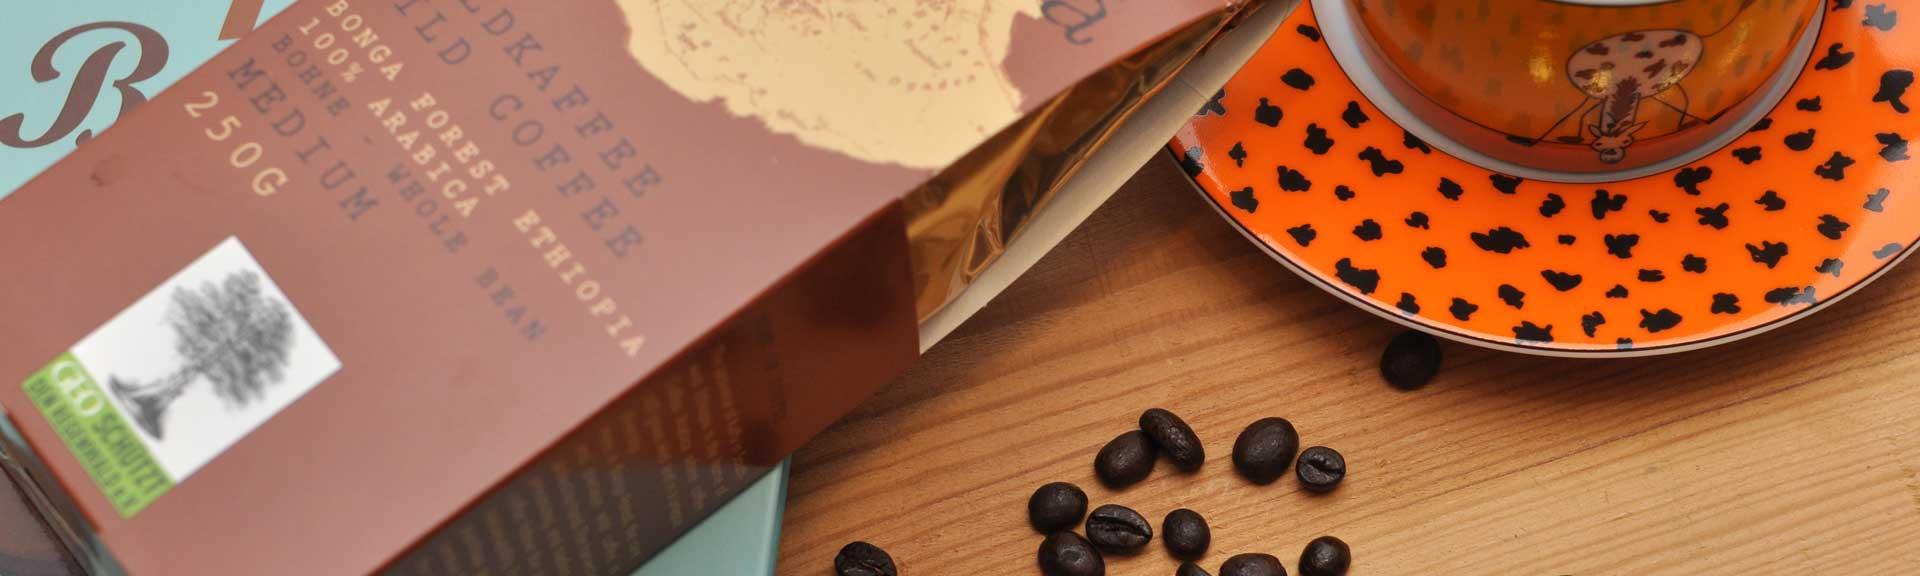 kaffa kaffee wildkaffee äthiopien